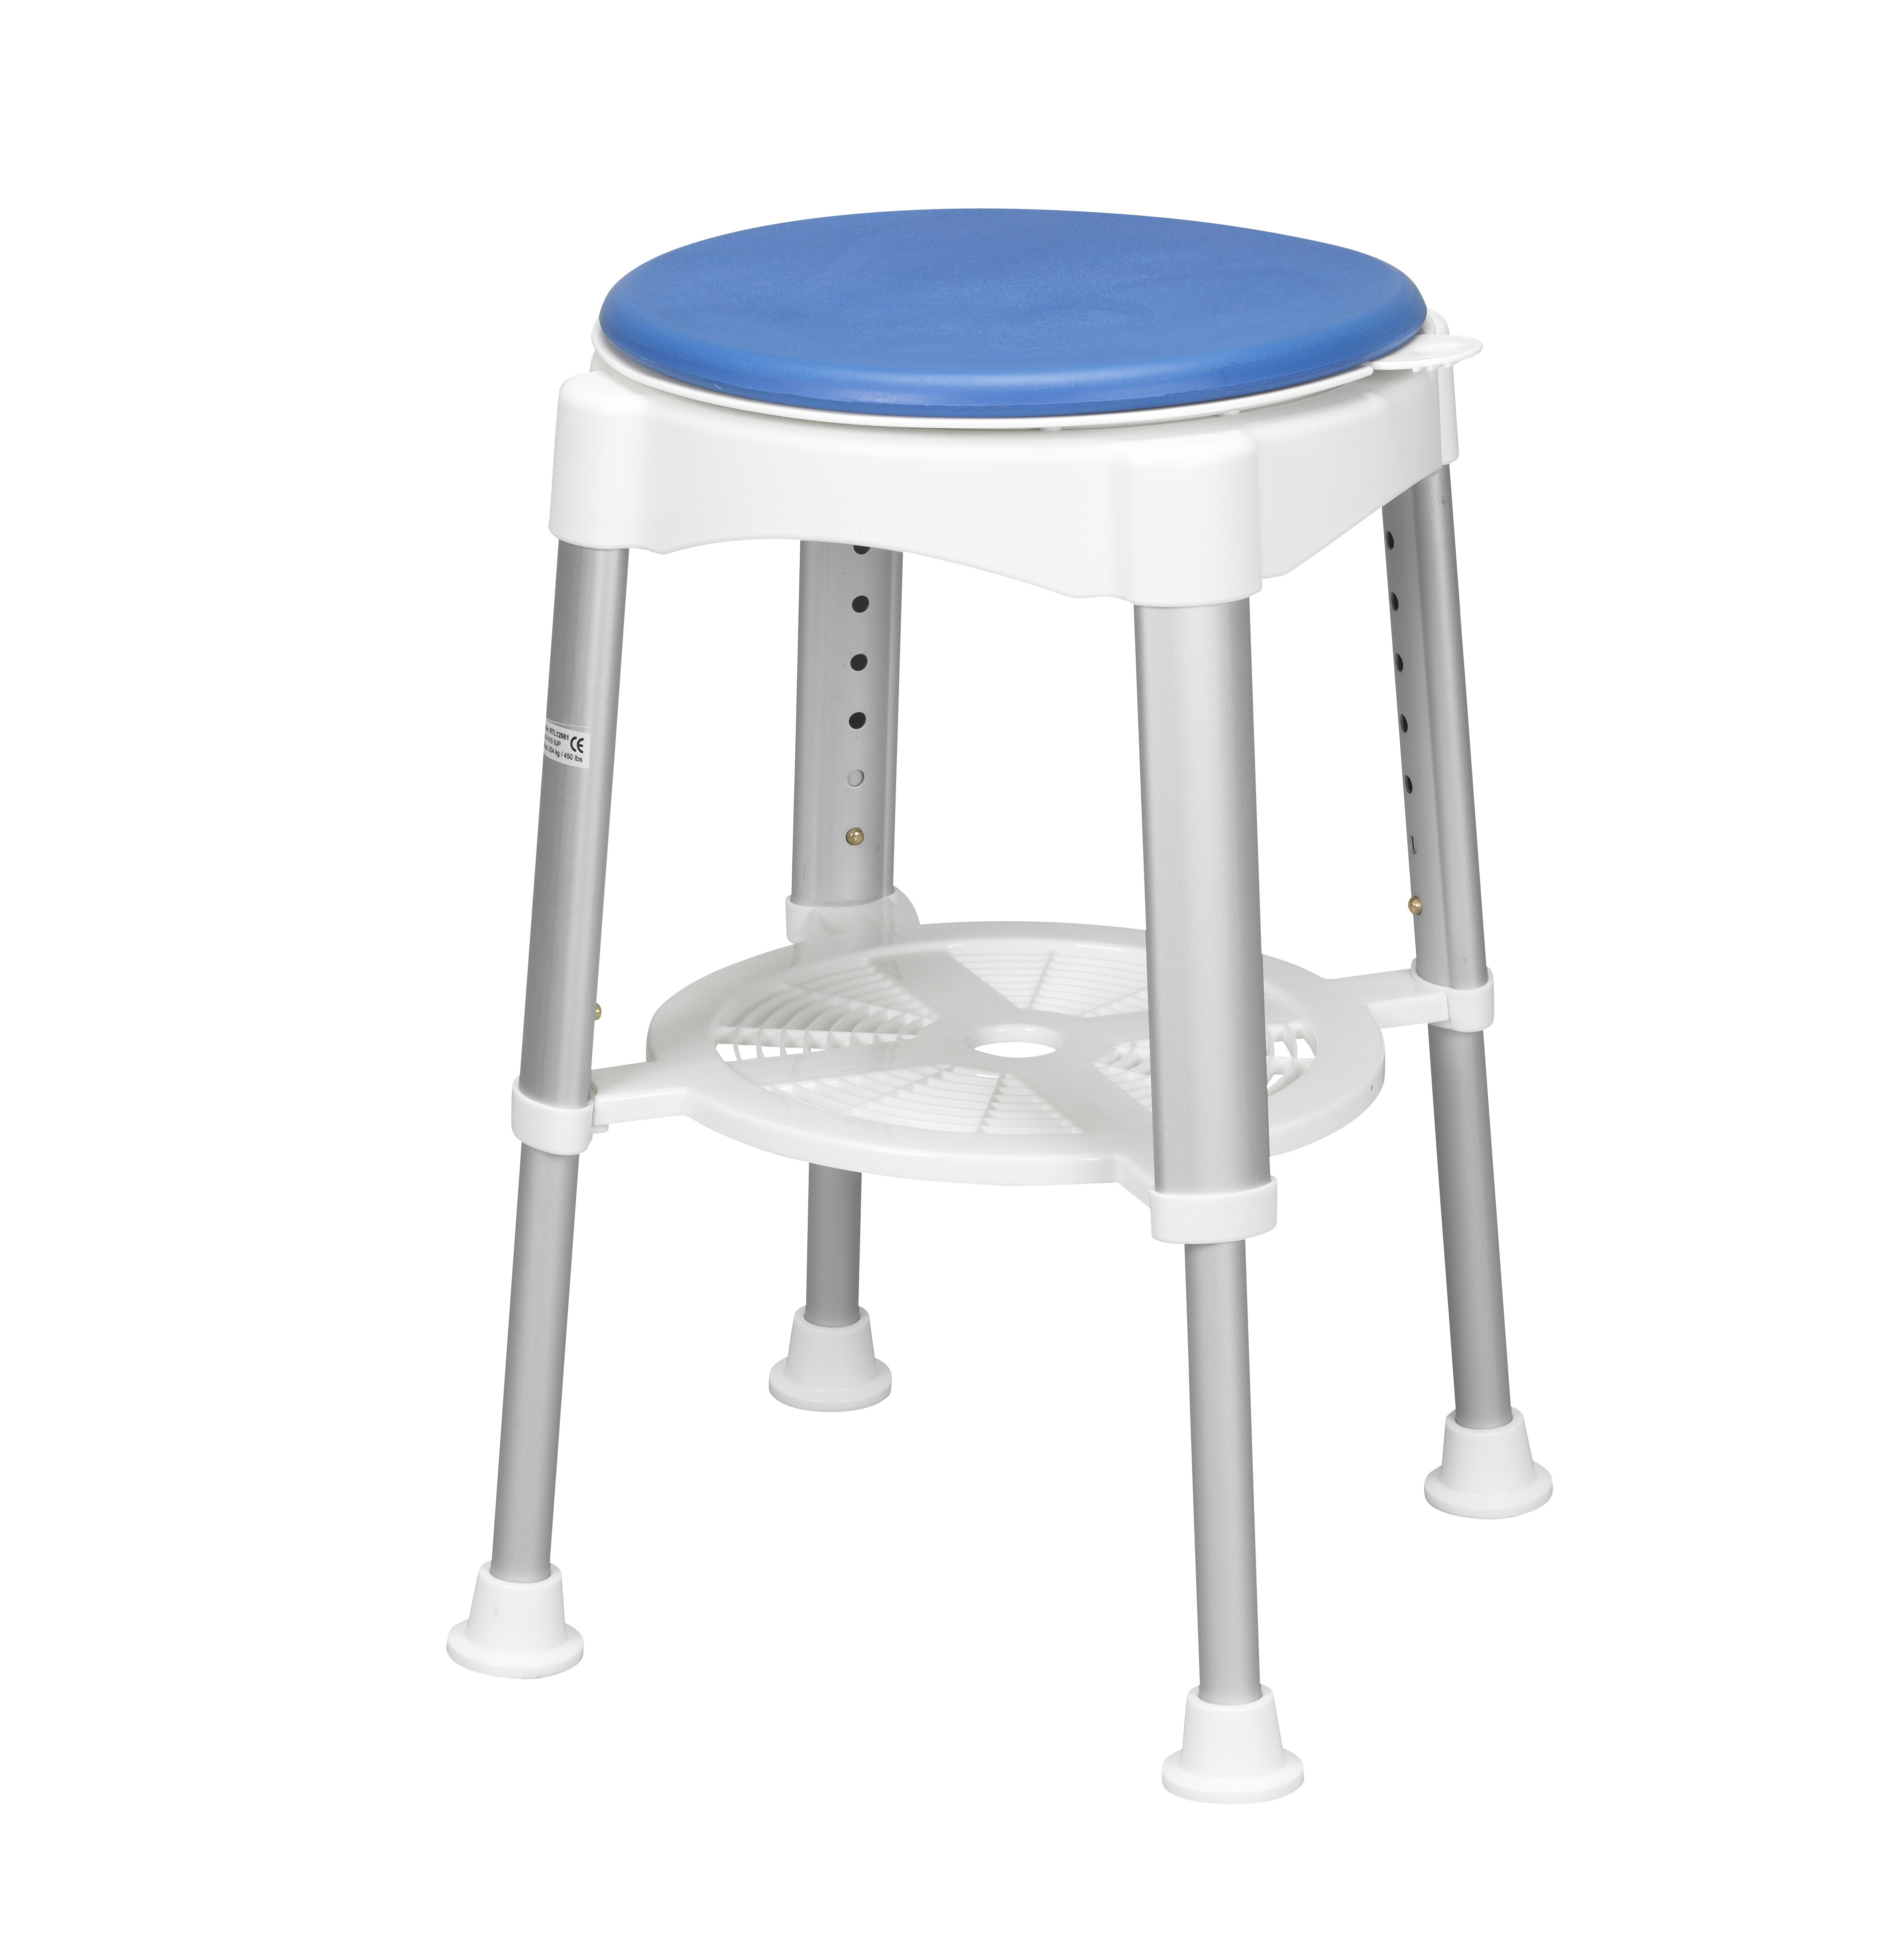 bath_stool_with_padded_rotating_seat.jpg